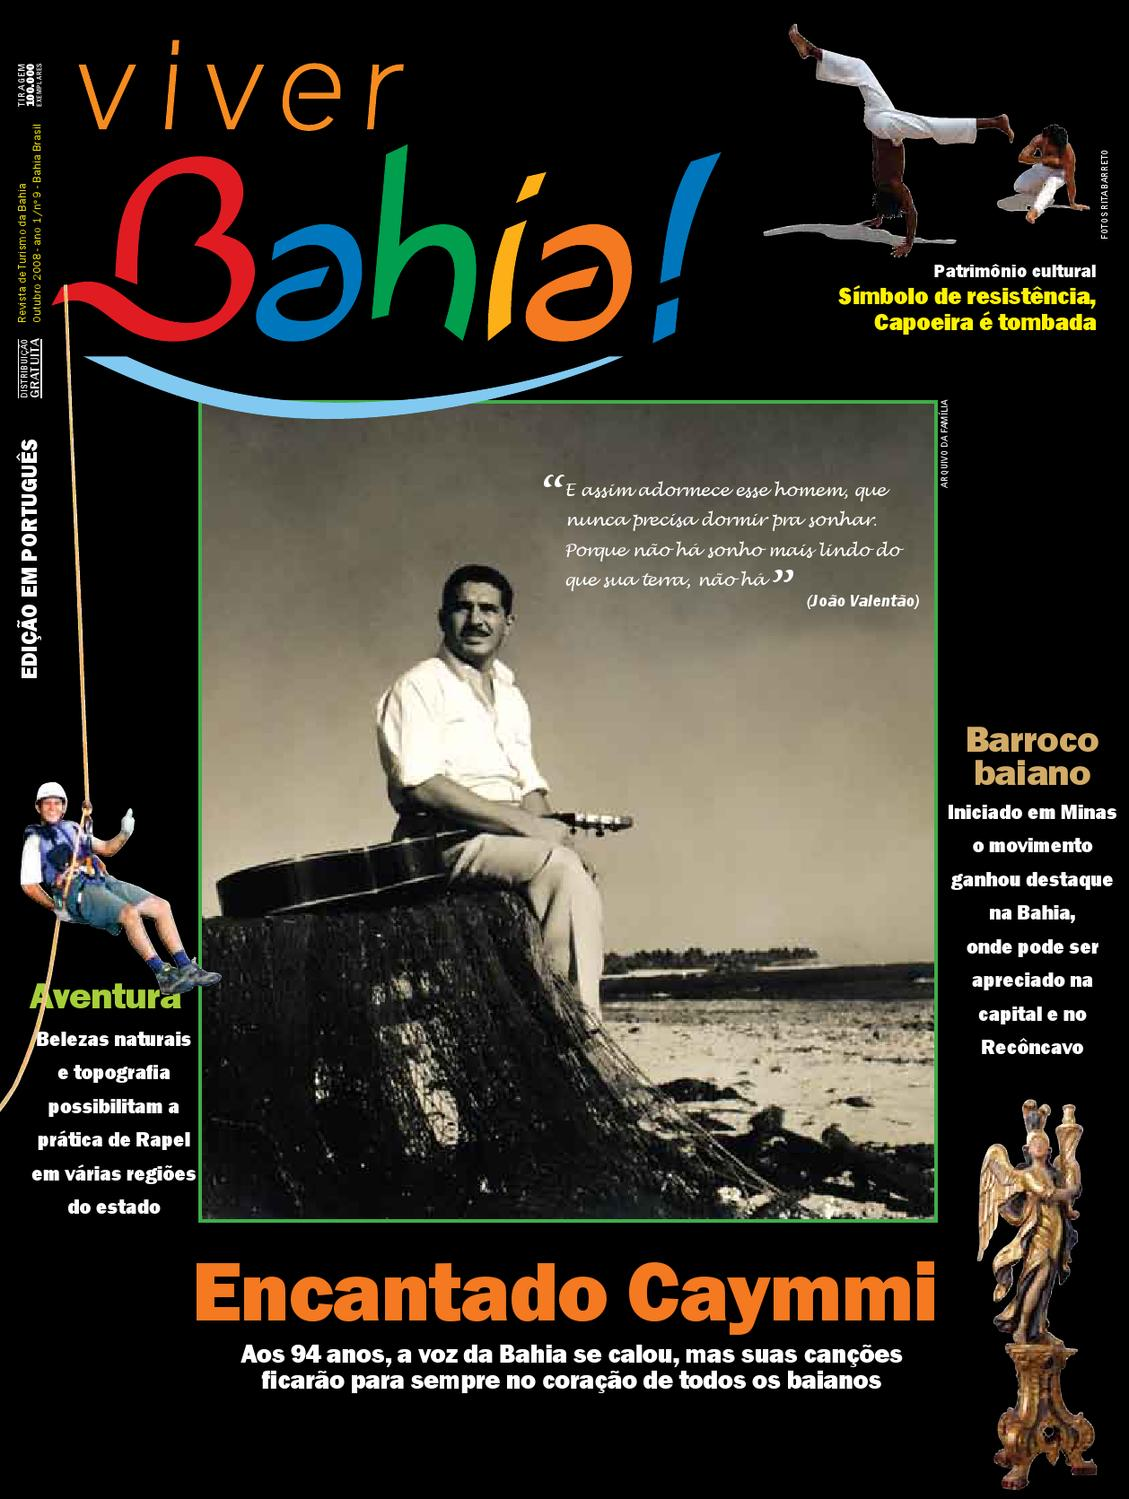 Viver Bahia - Nº09 by Secretaria de Turismo da Bahia - issuu